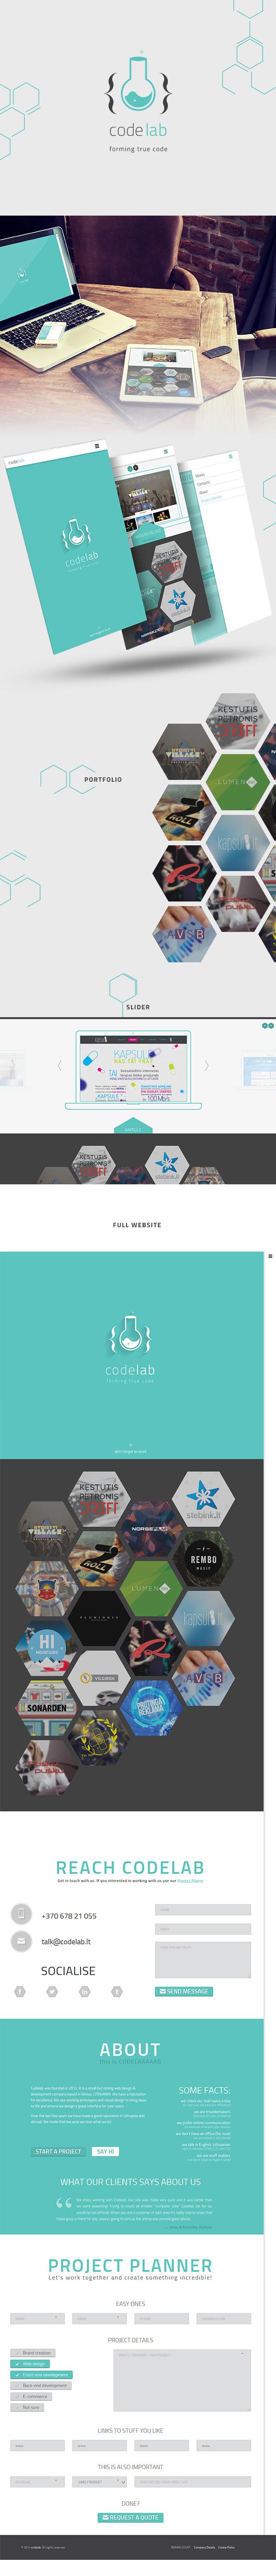 codelab wordpress portfolio simple flat Web agency studio design color creative html5 minimal One Page